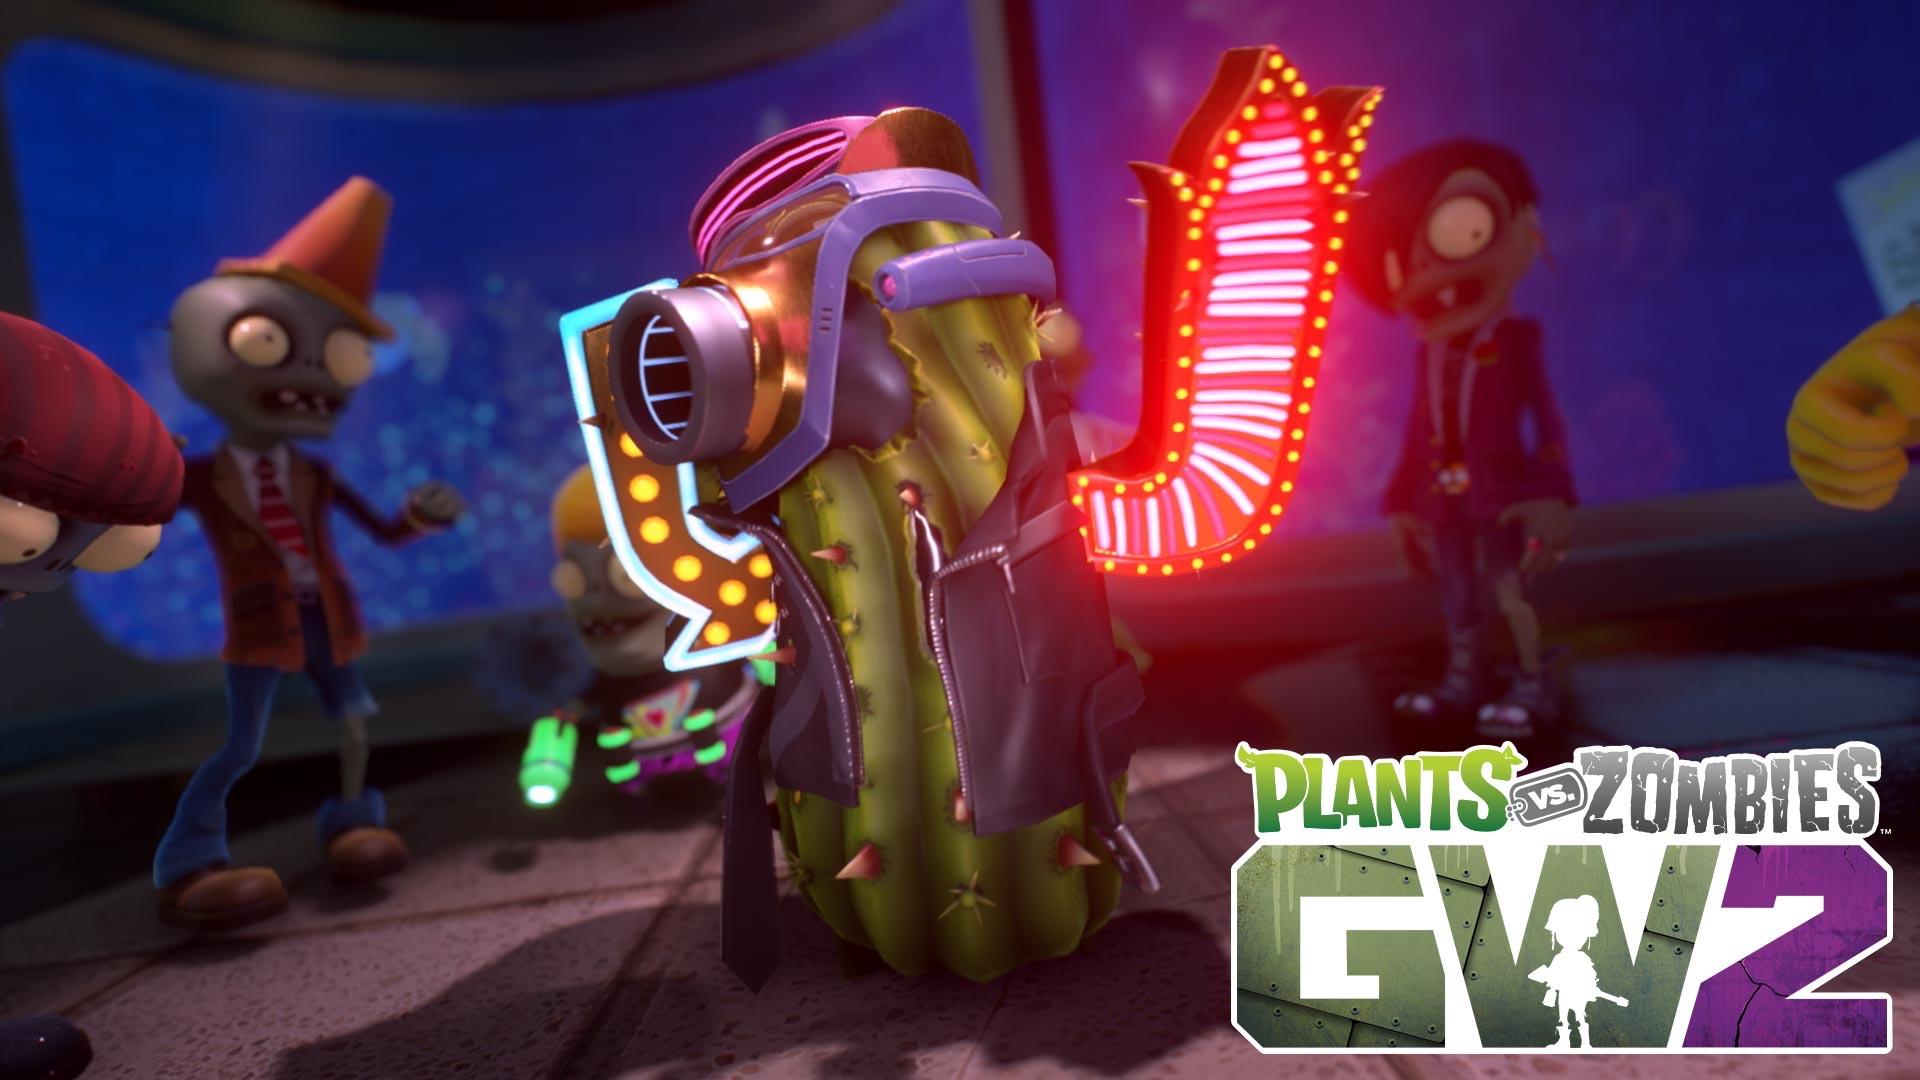 plants vs zombies garden warfare 2 achievement guide